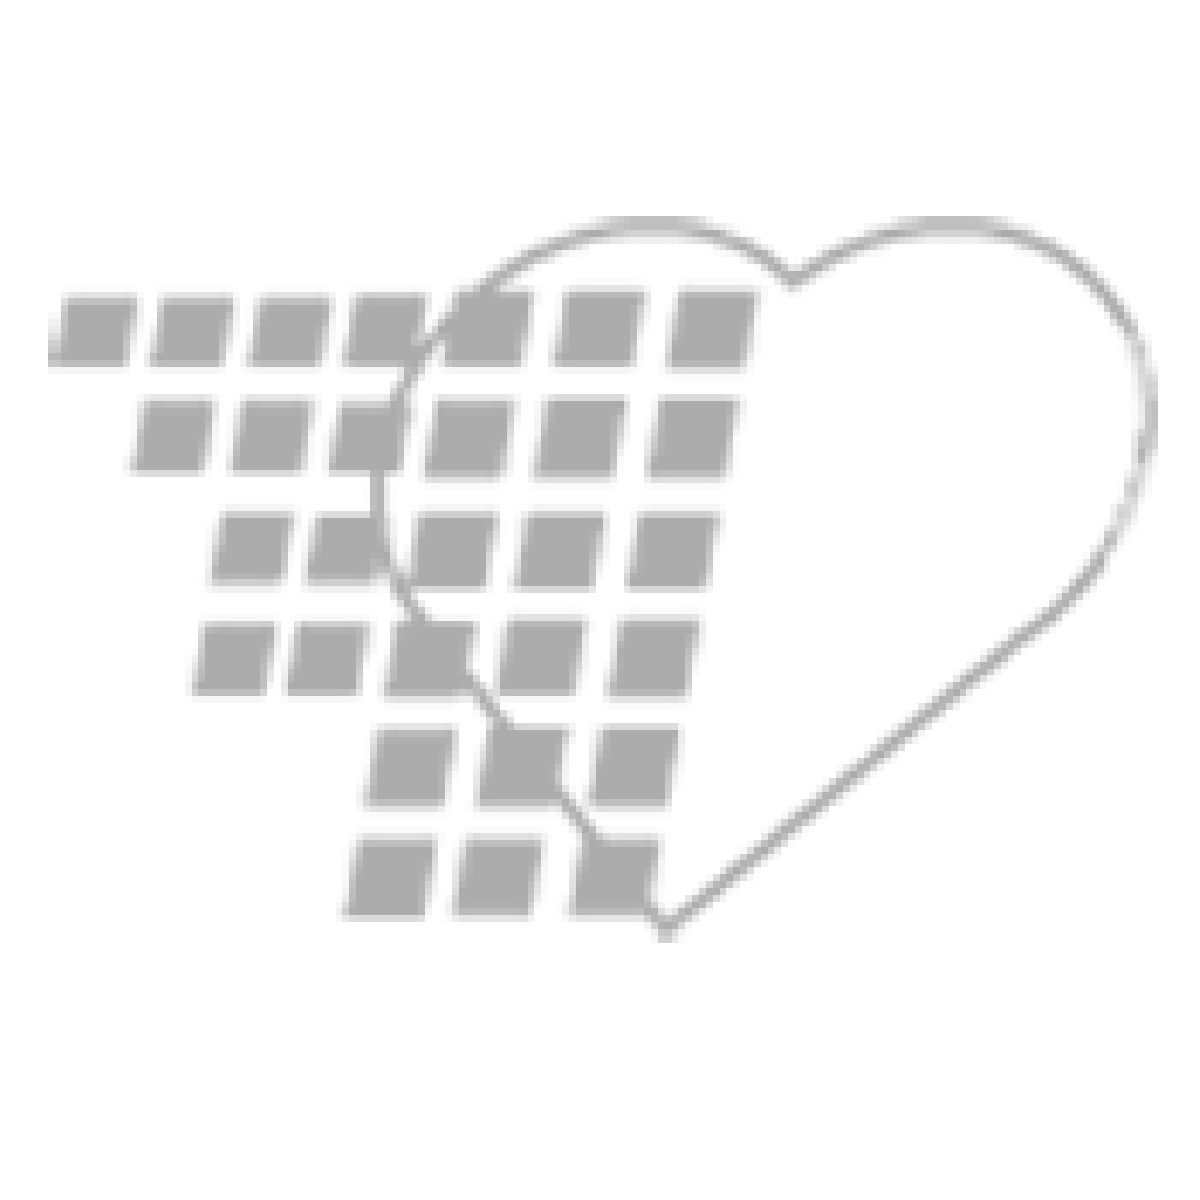 05-02-2604P BD® ChloraPrep Applicator (Ships ORMD)